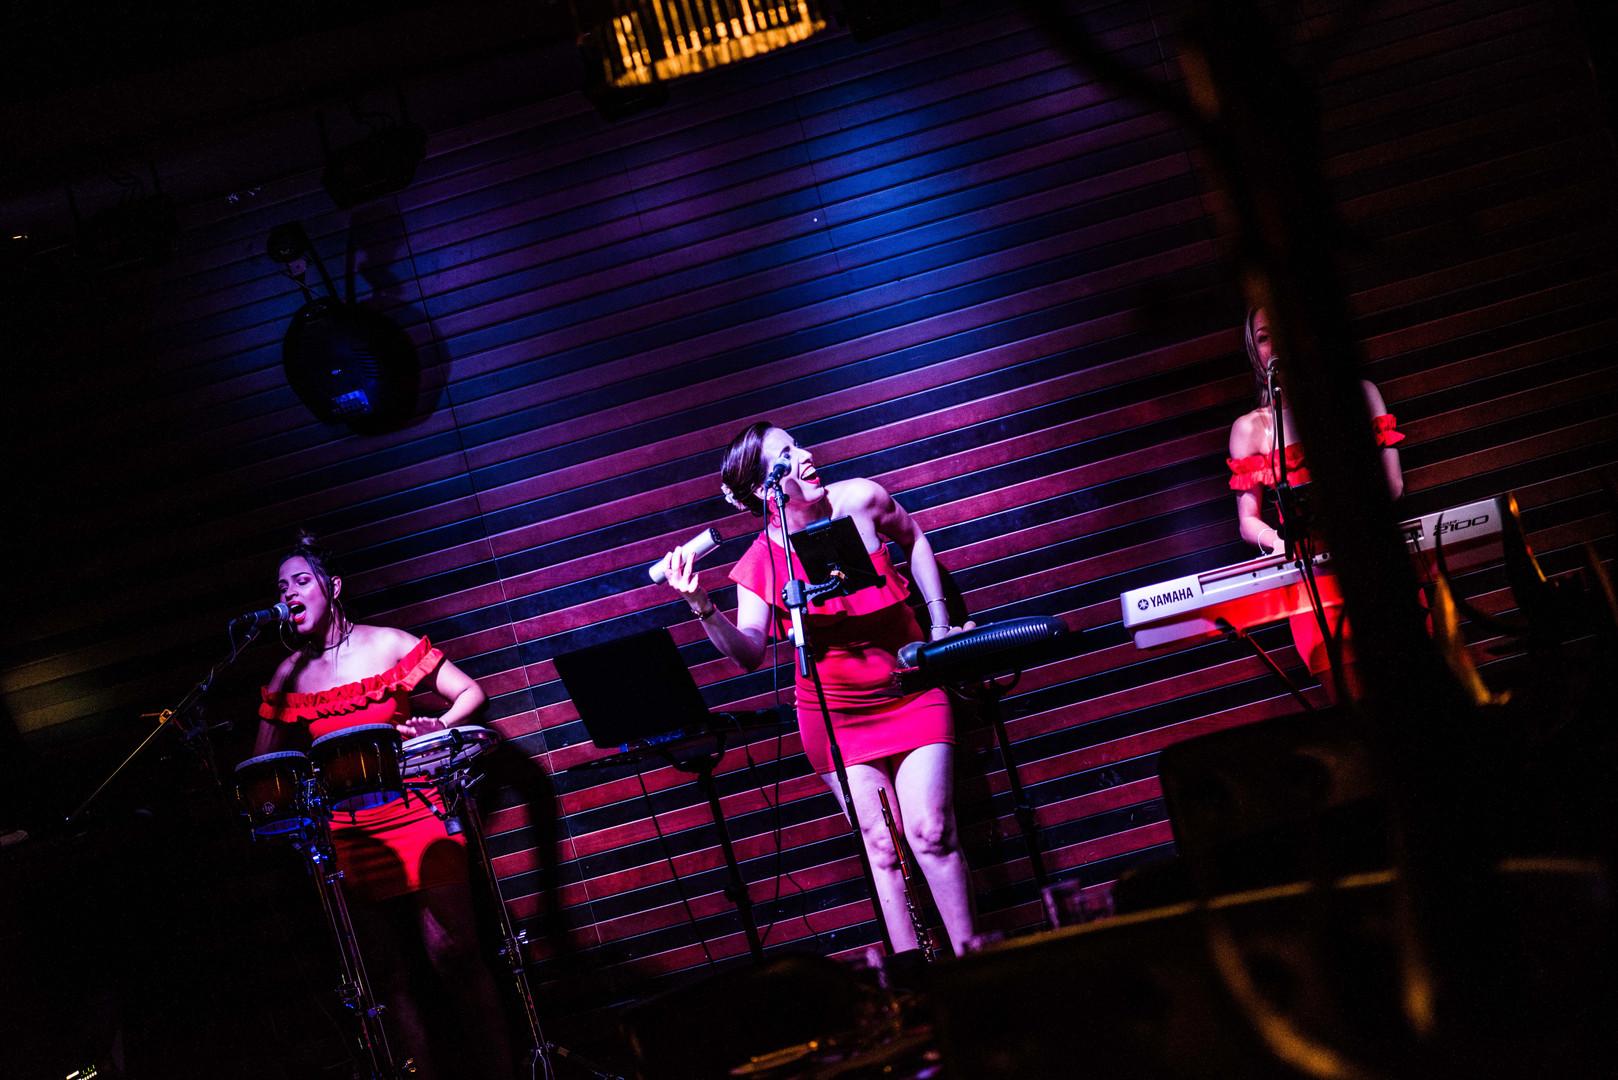 Chamas Live Band